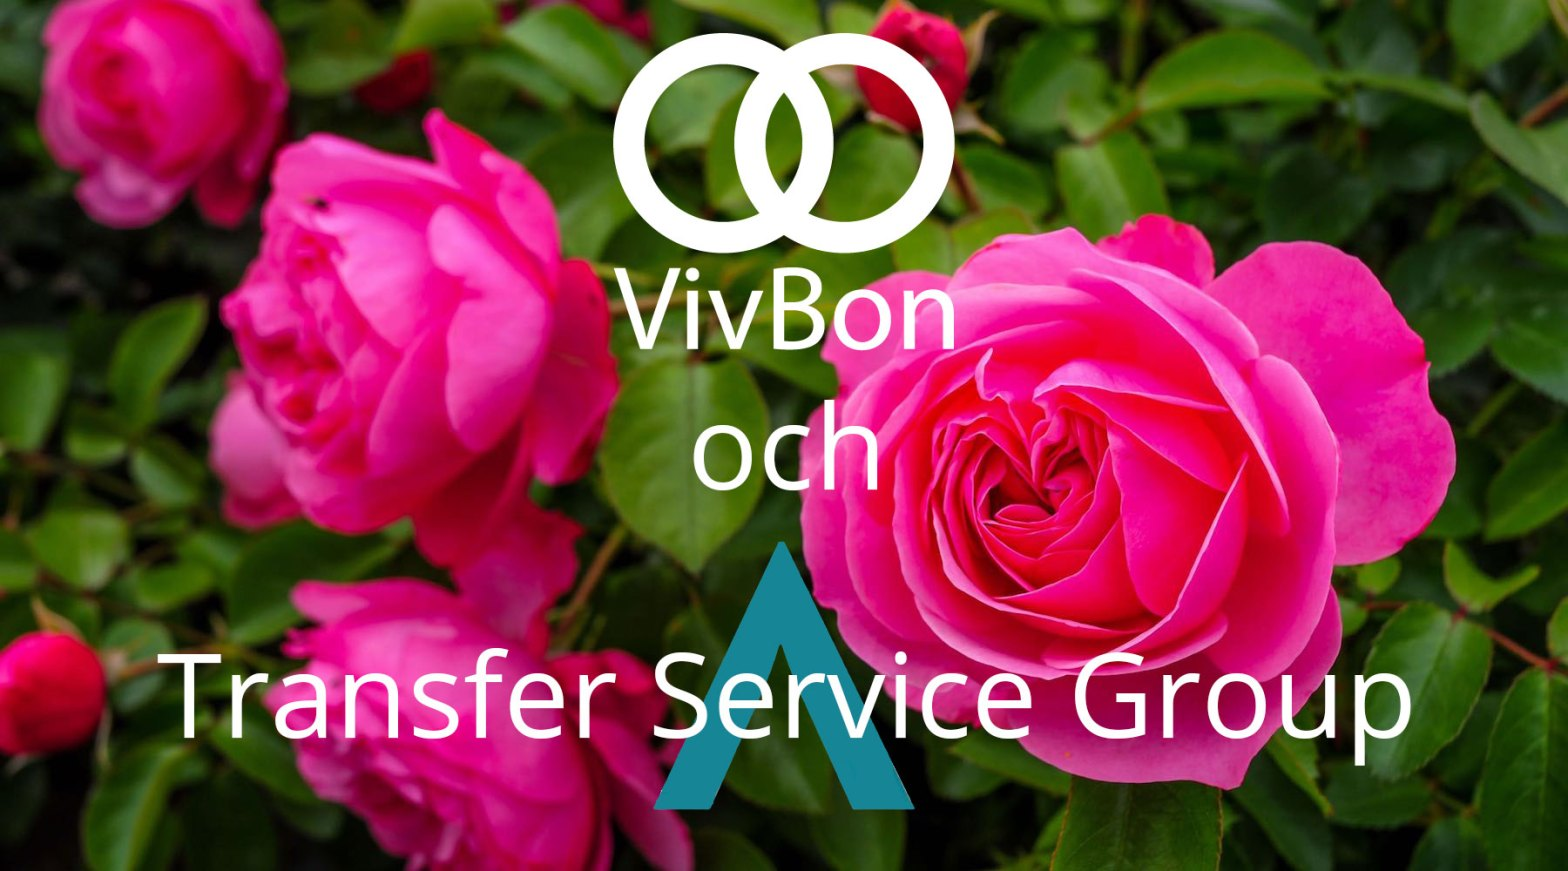 VivBon och Transfer Service Group